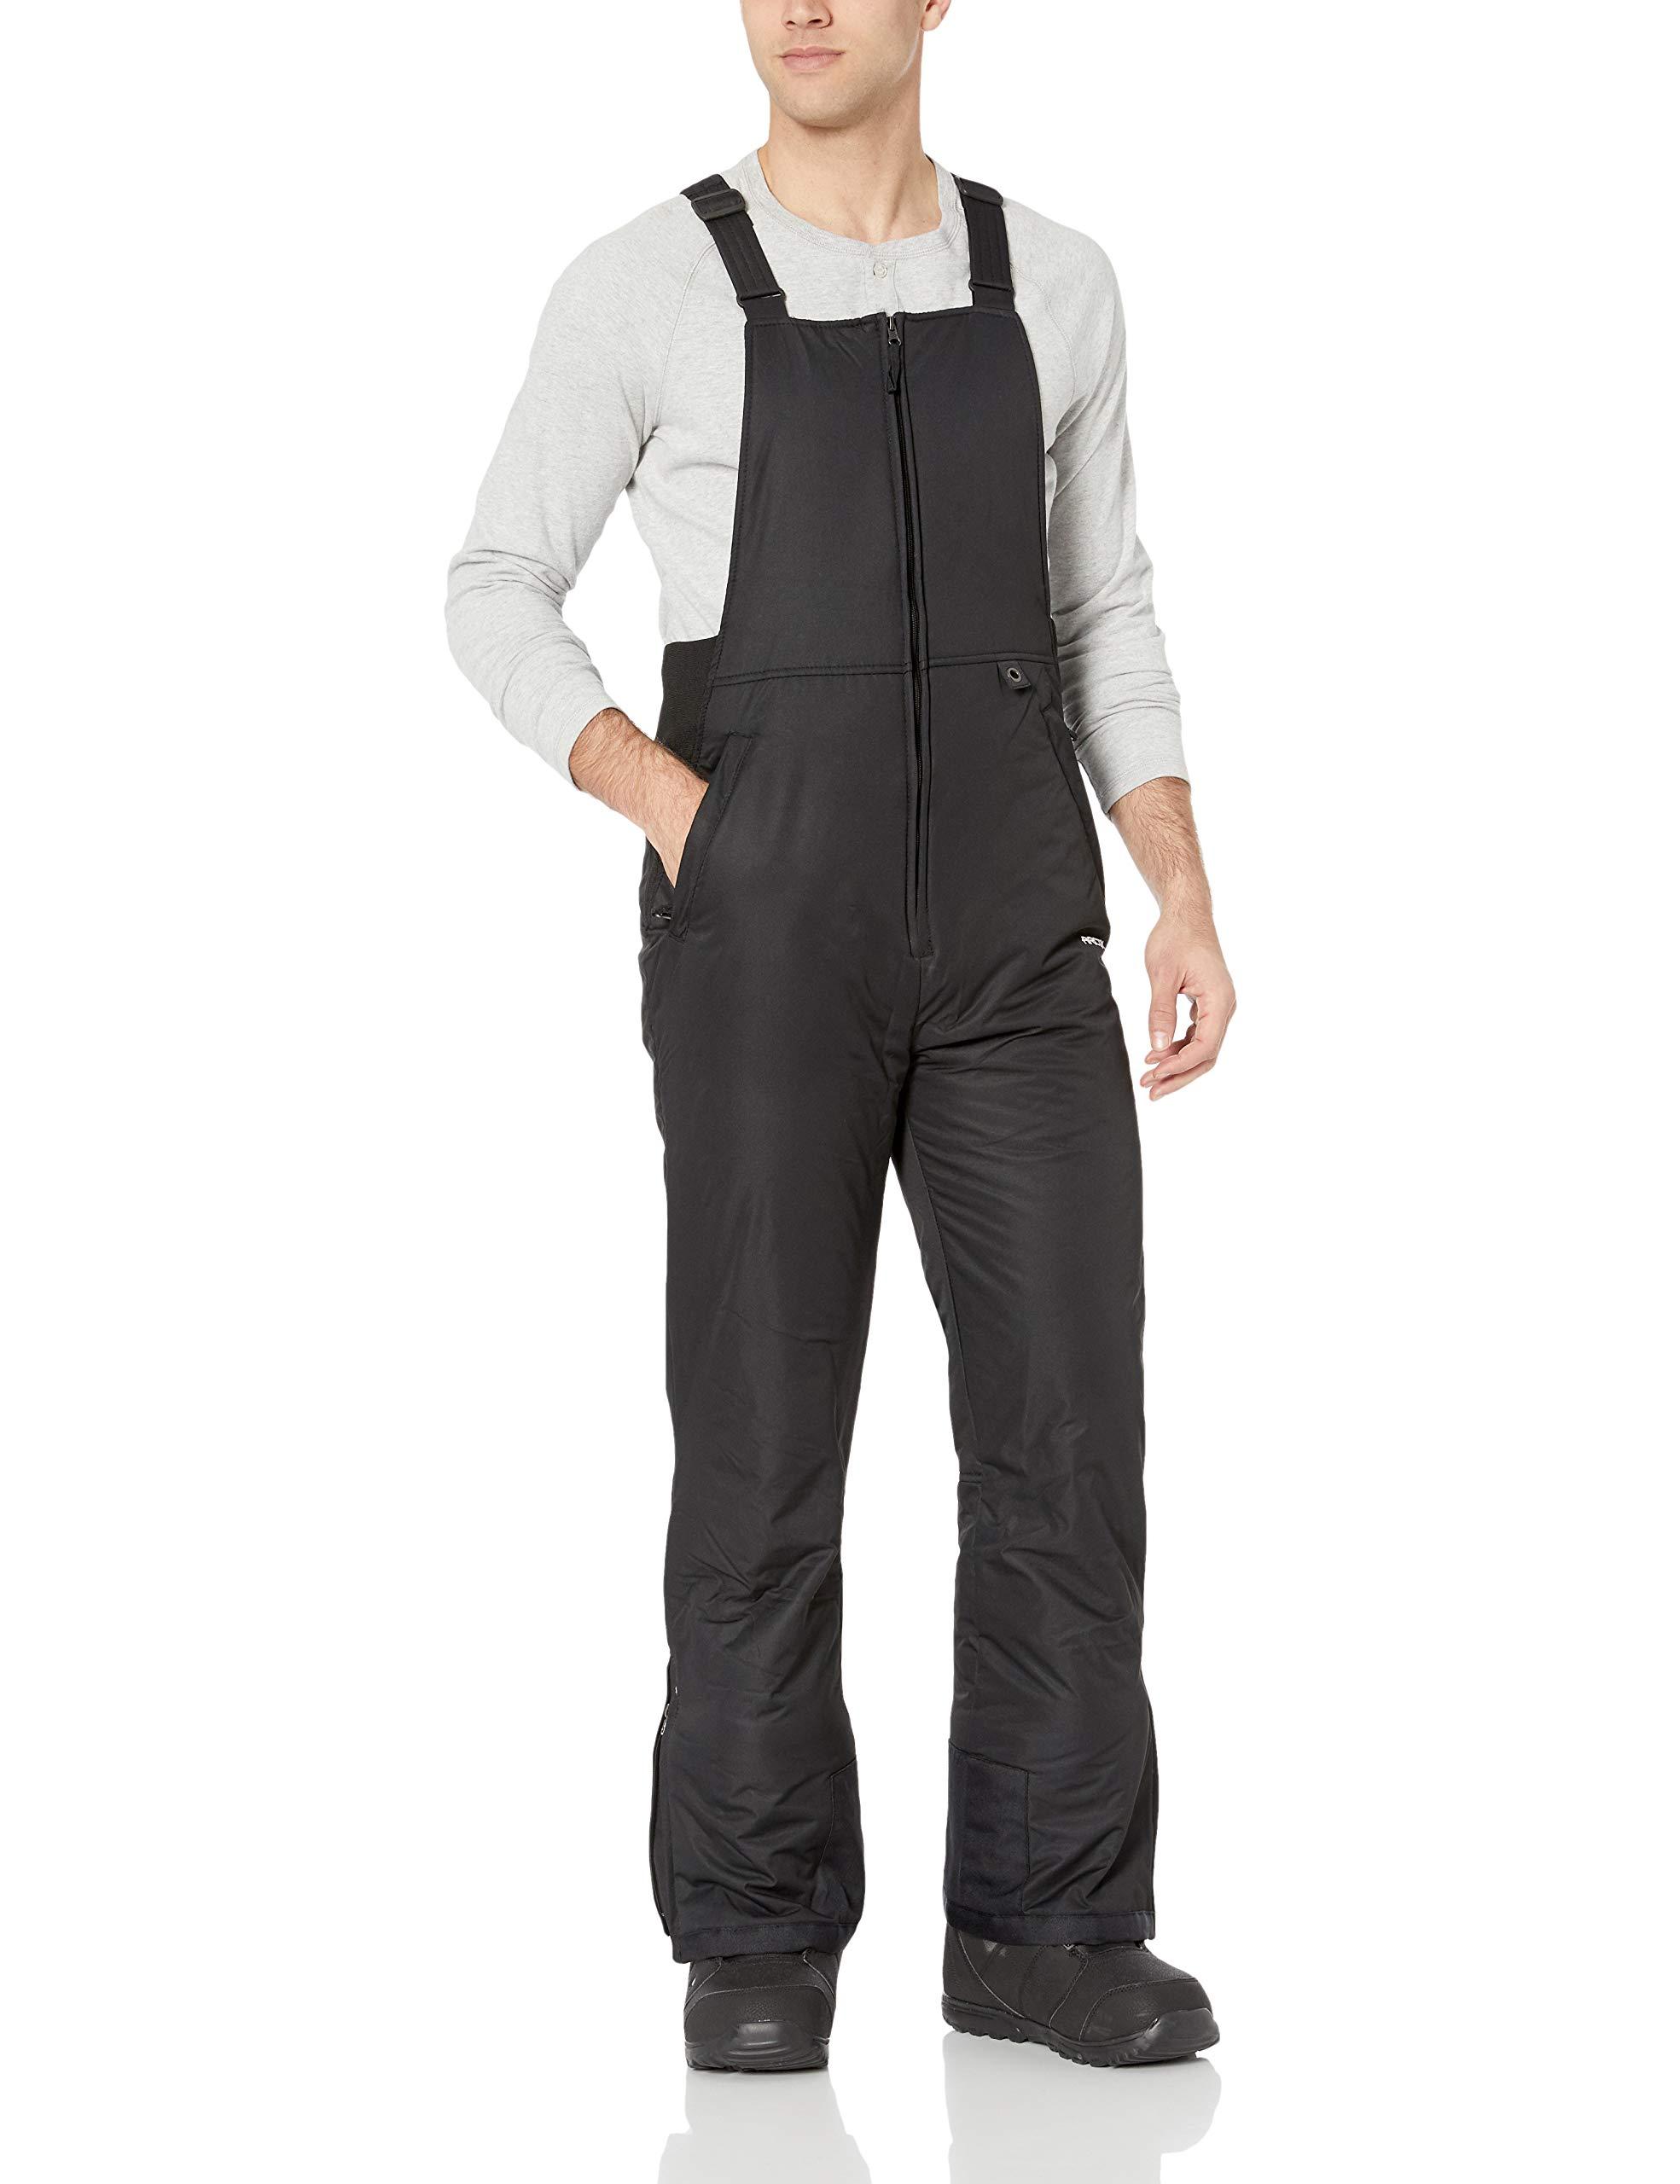 Arctix Men's Essential Insulated Bib Overalls, Black, Small (29-30W 34L) by Arctix